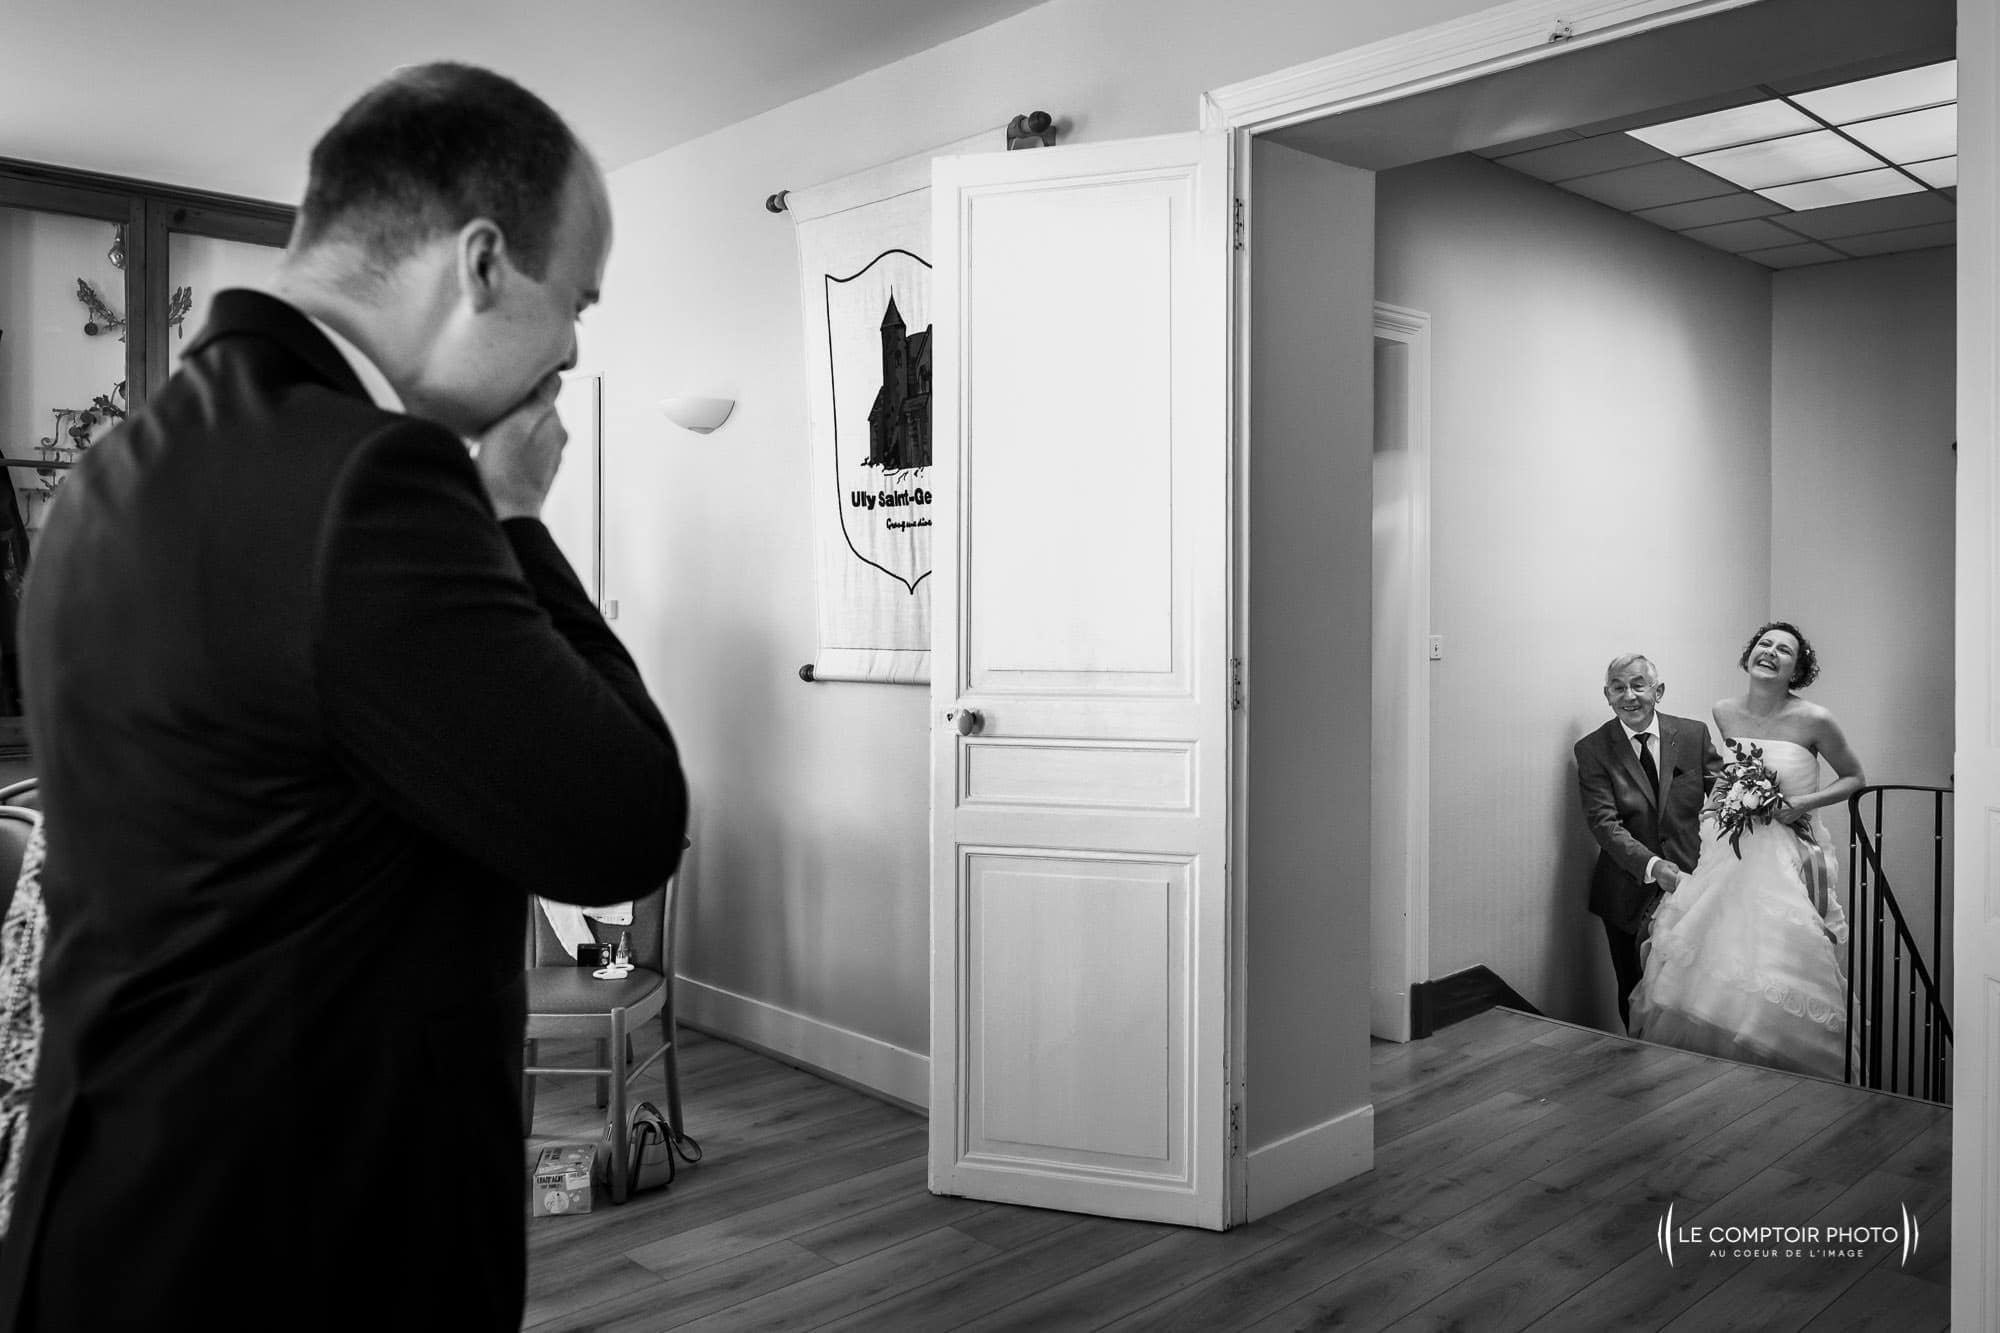 photographe dinan - mariage - côtes d'armor en Bretagne